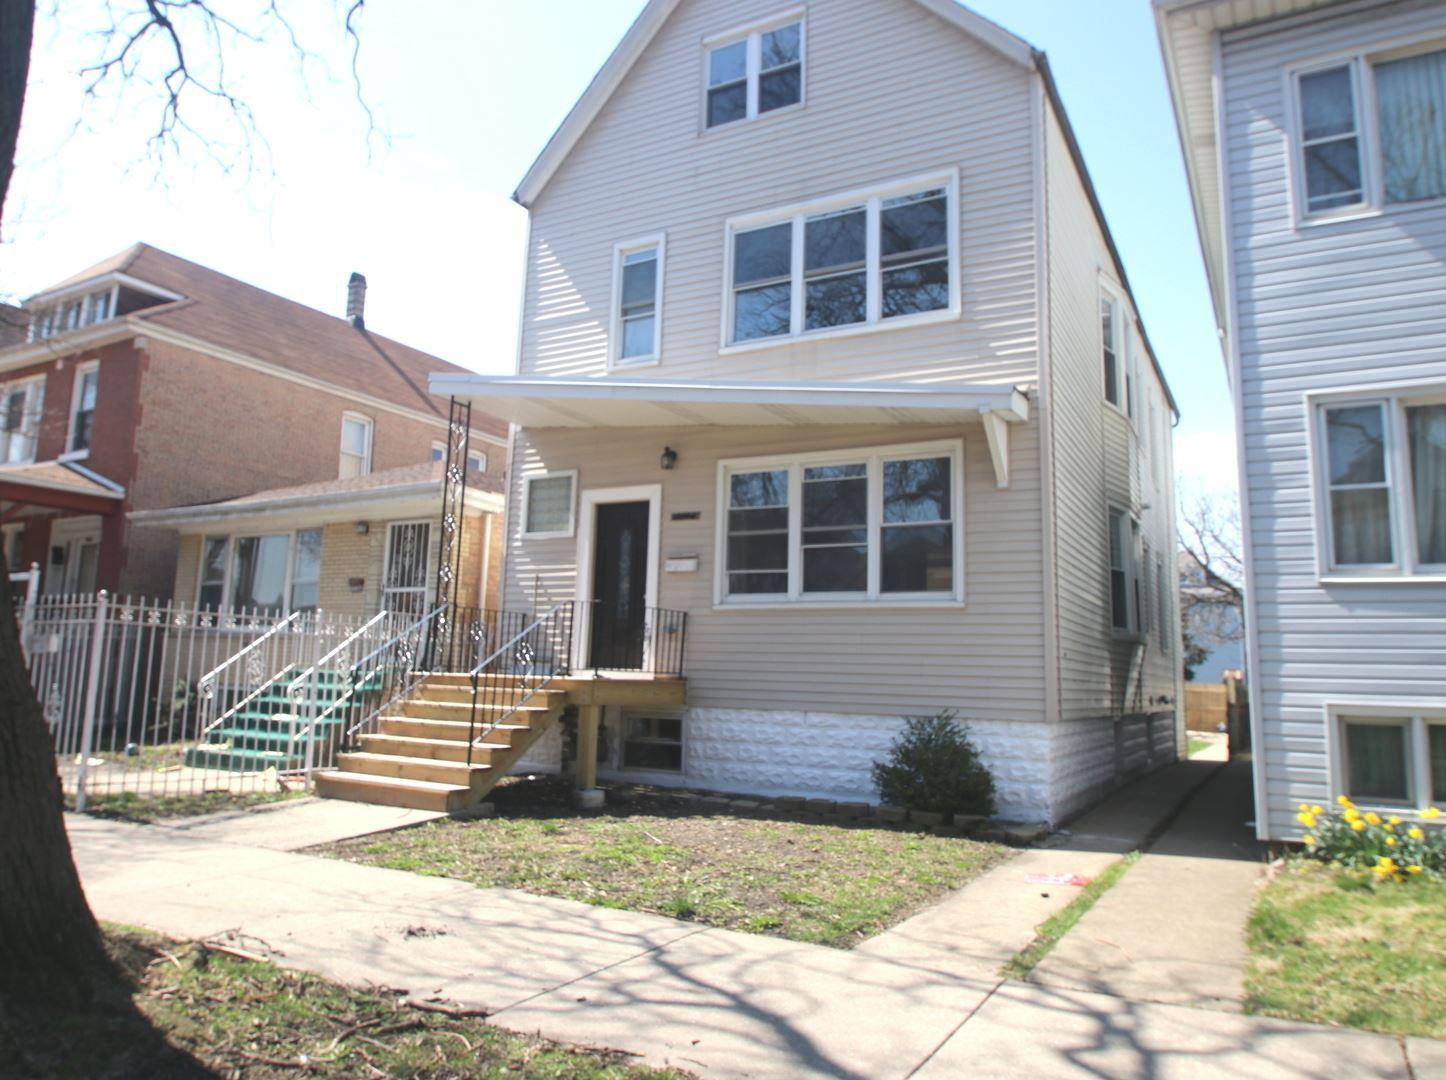 4406 S Maplewood Avenue, Chicago, IL 60632 - #: 10682651